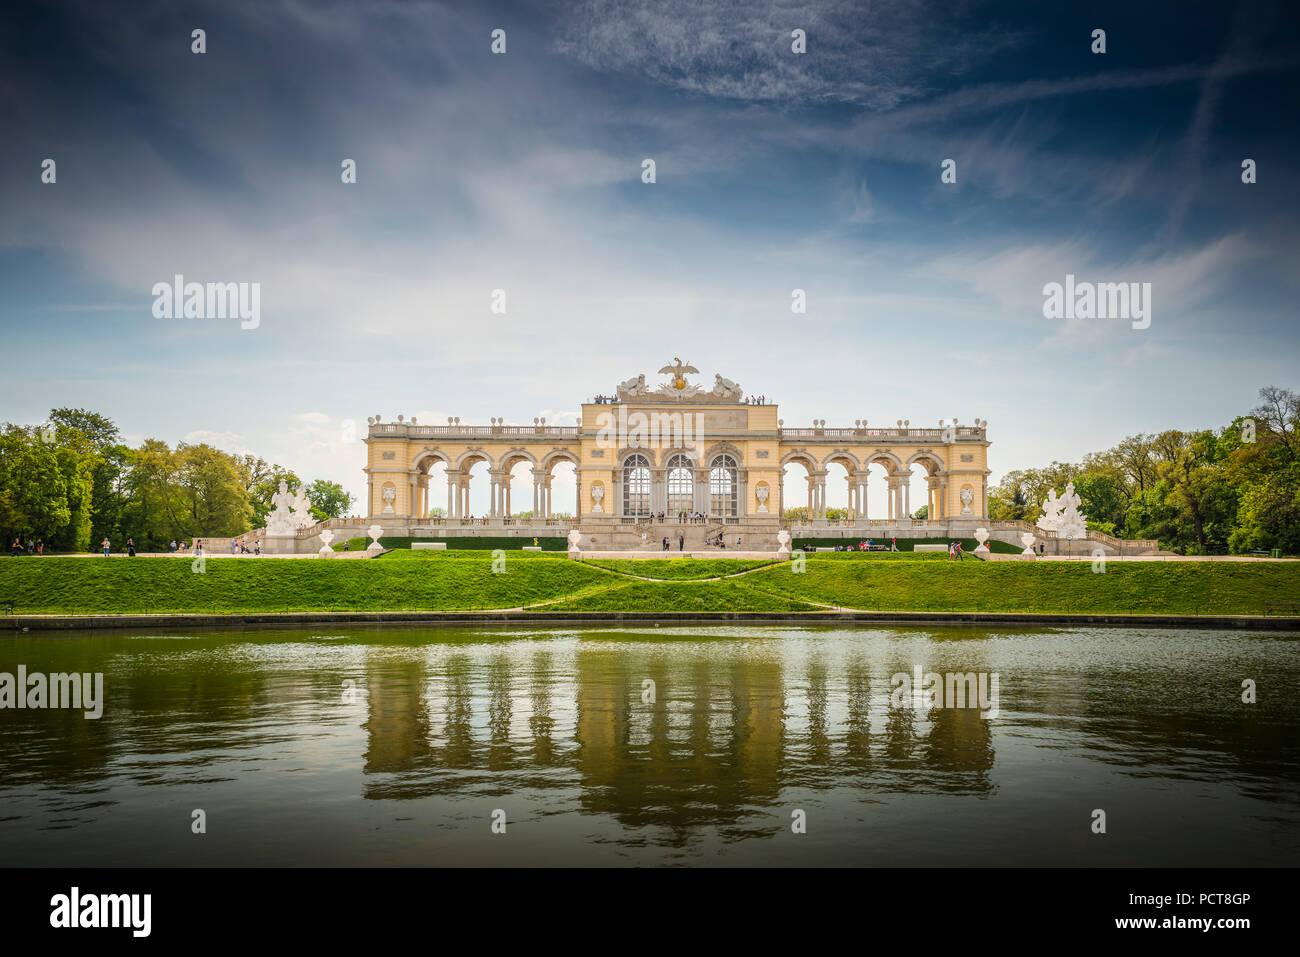 Europa, Österreich, Wien, Schloss, Palast, das Schloss Schönbrunn, Gloriete, Schlosspark, Wien, Österreich, Architektur, Kapital Stockbild